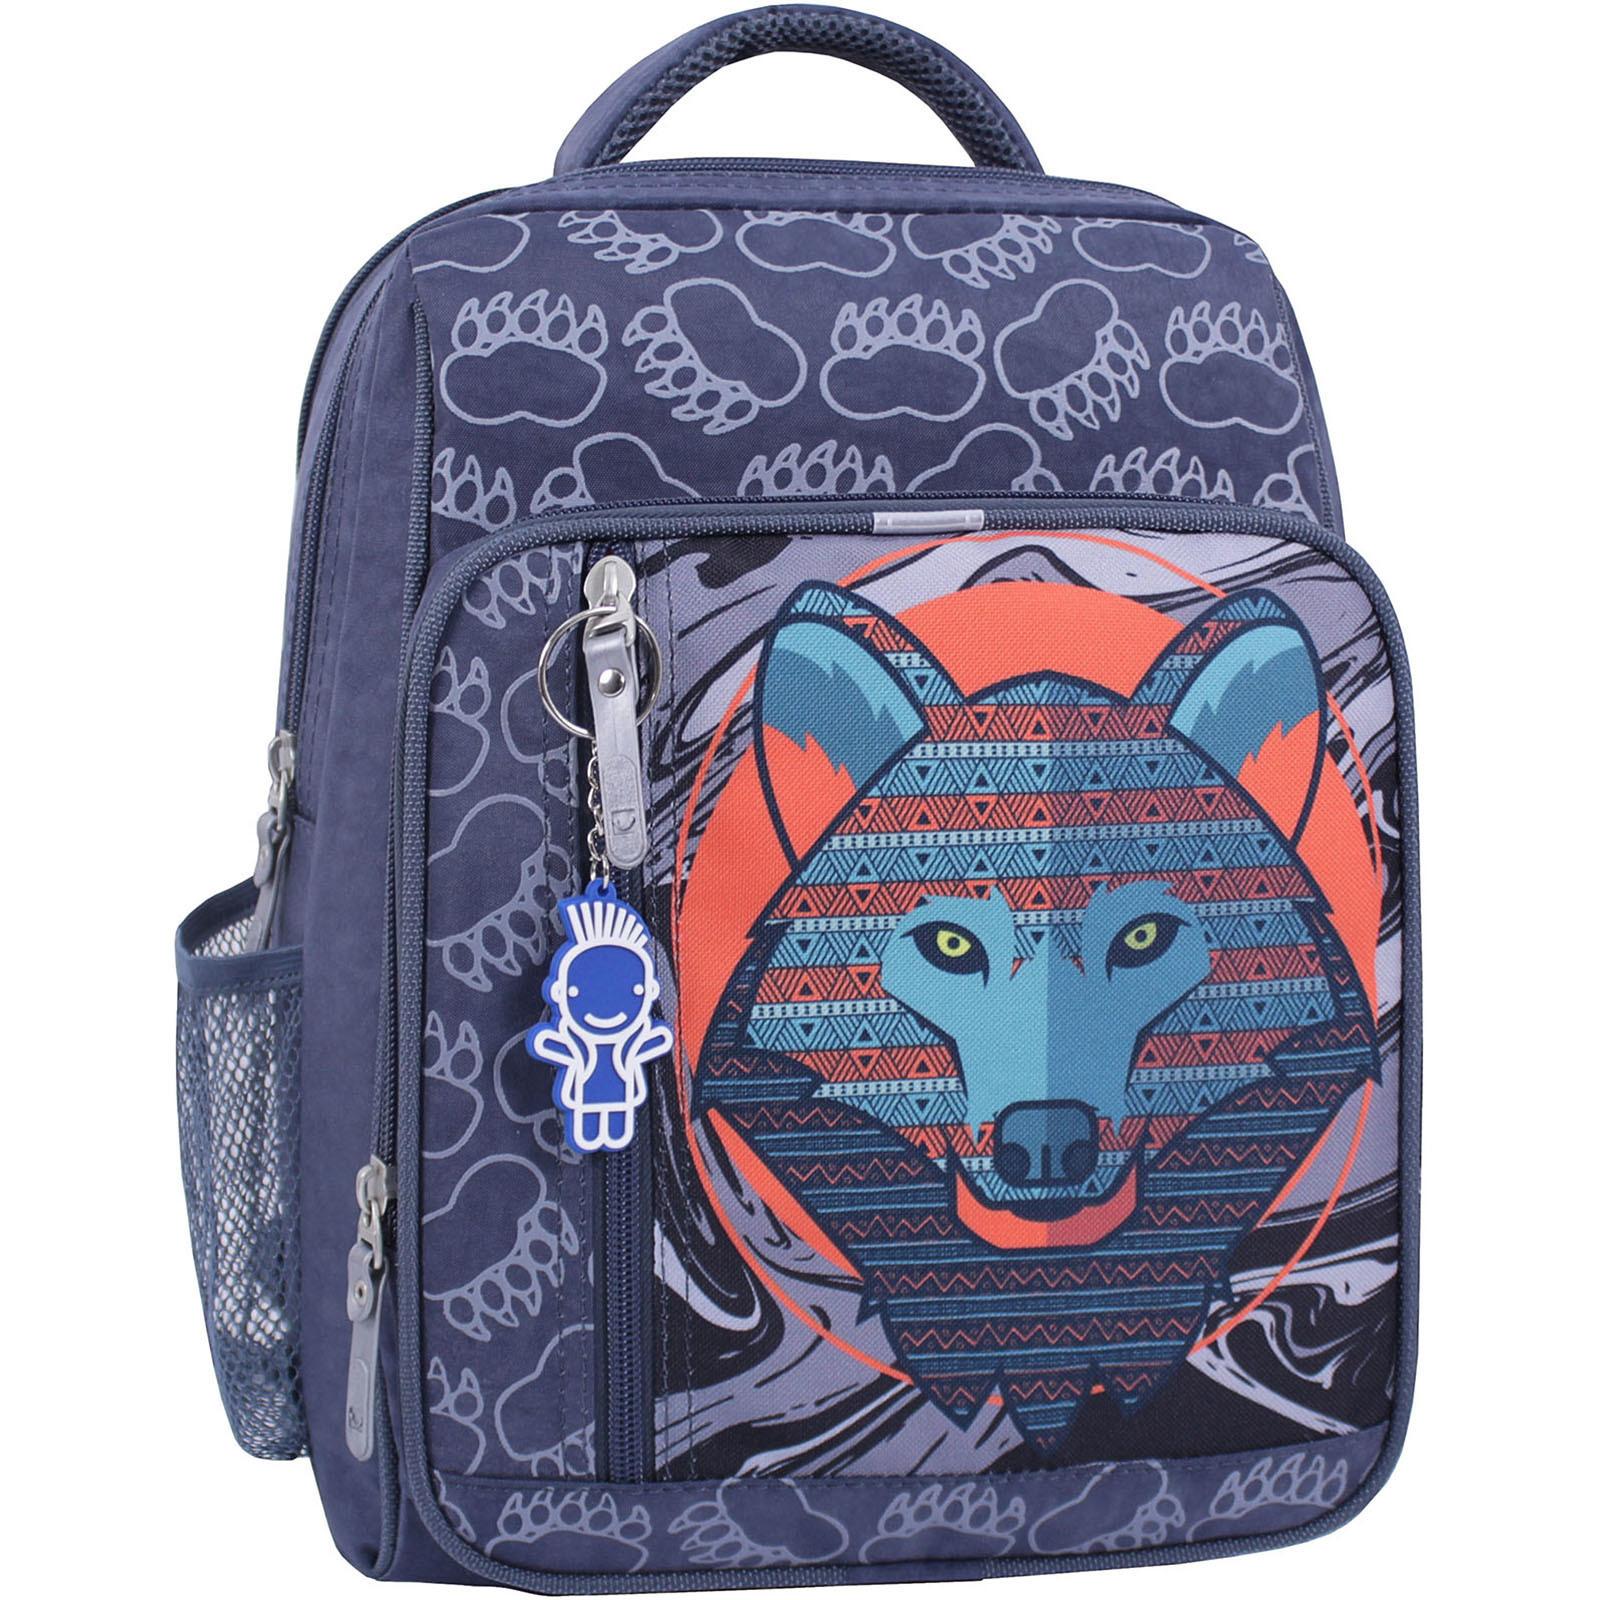 Школьные рюкзаки Рюкзак школьный Bagland Школьник 8 л. 321 серый 509 (00112702) IMG_1545_суб.509_.JPG